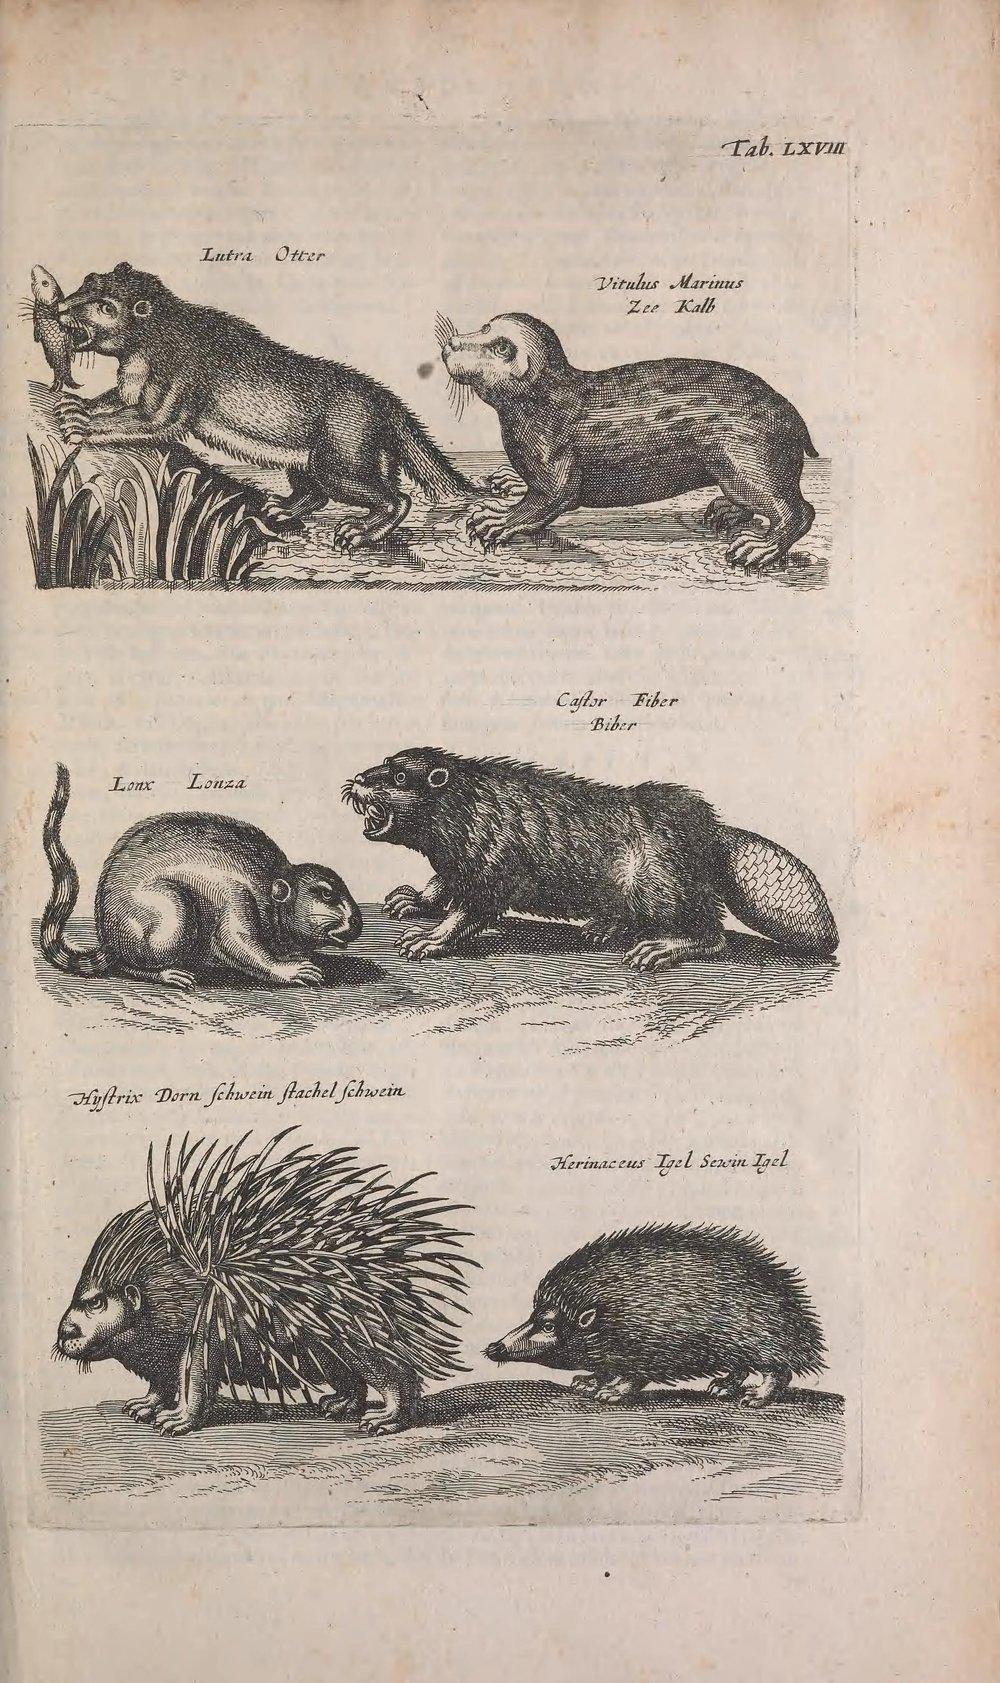 Jan Jonston (1603-1675),  Historiae naturalis de quadrupedibus libri, cum aeneis figuri s, Johannes Jonstonus, medicinae doctor, concinnavit Amsterdam, Schipper, 1657, tav. LXVIII